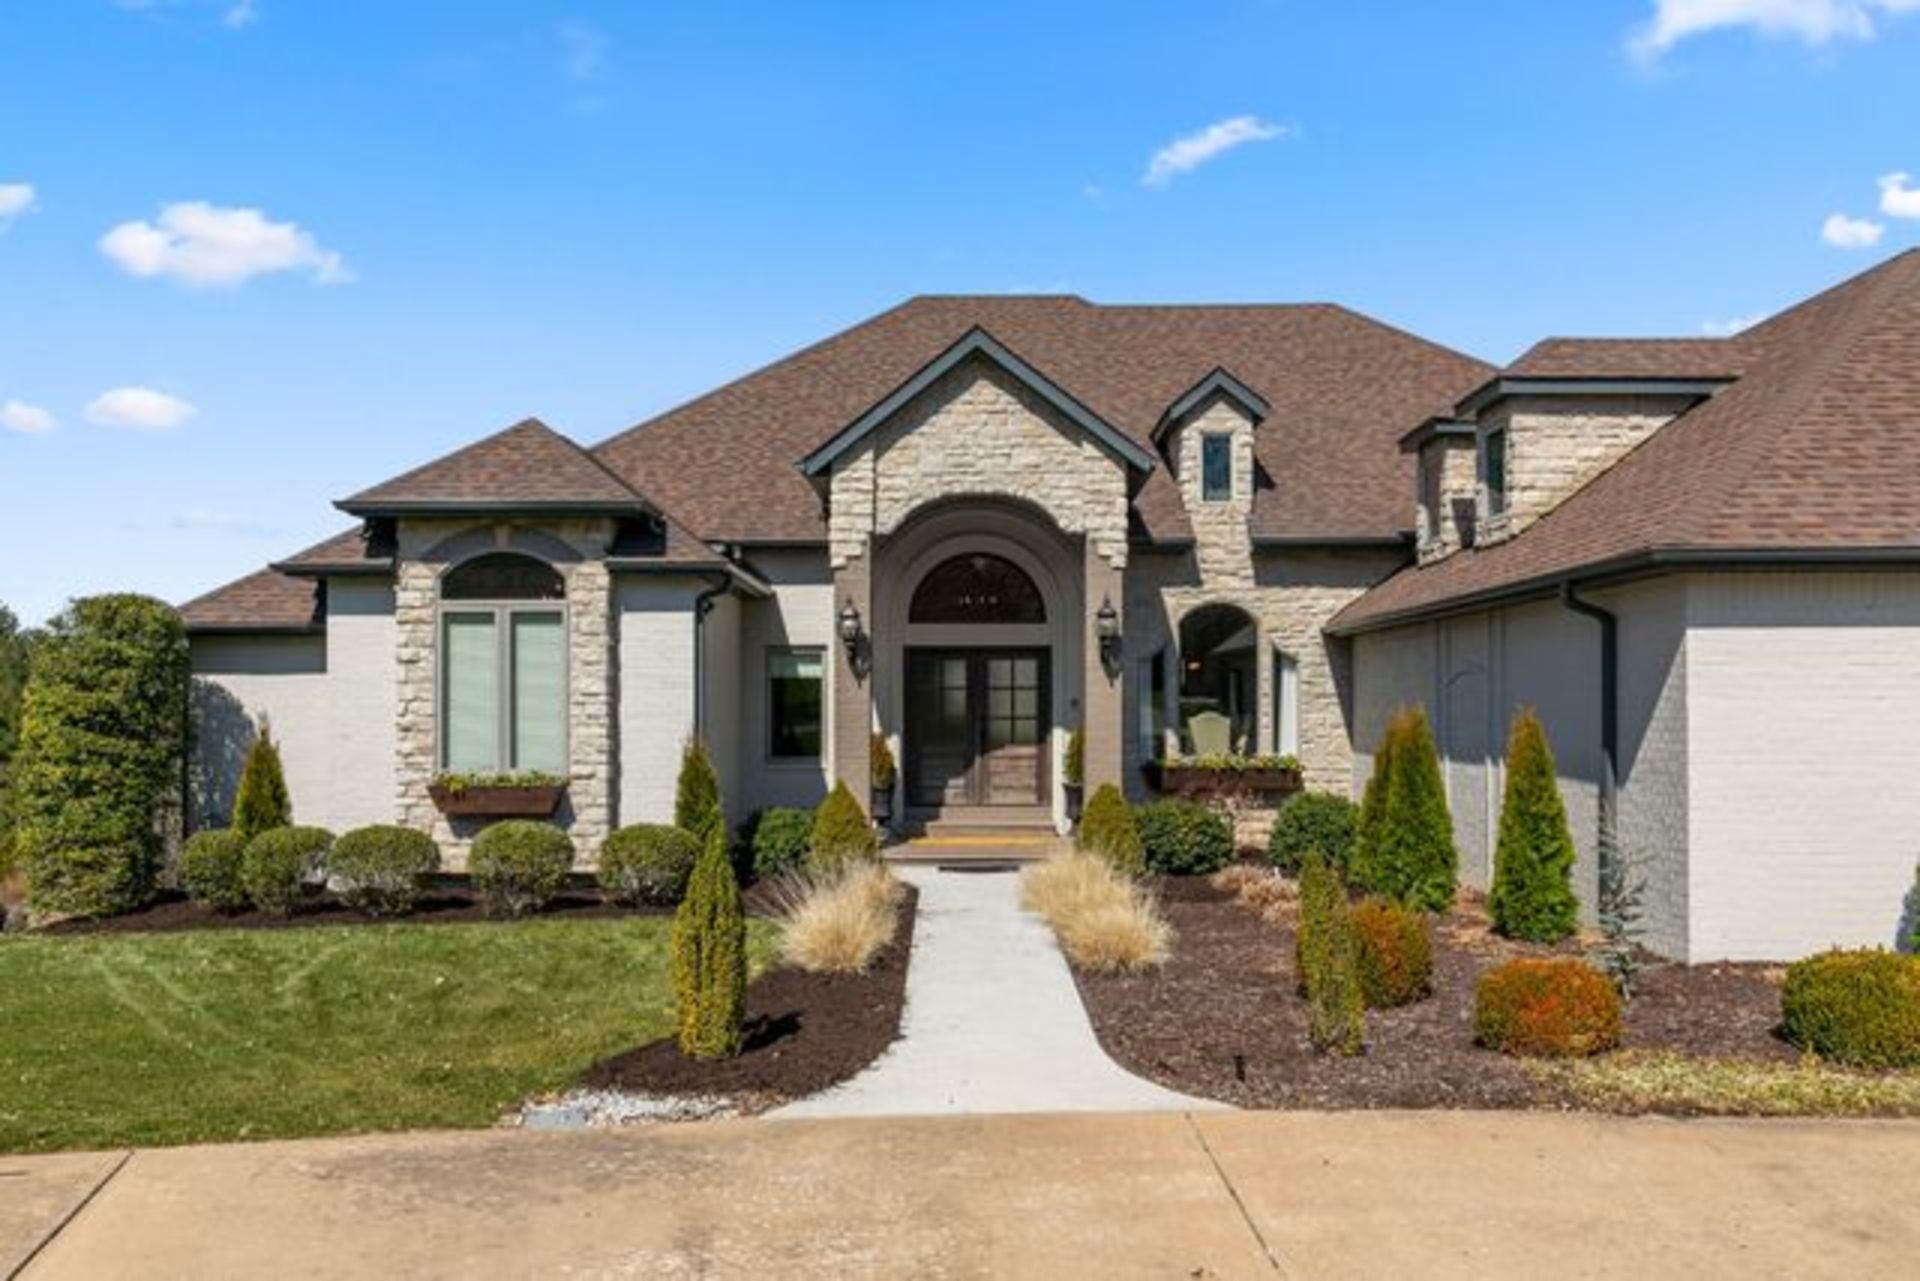 Beautiful Home in Springfield, Missouri